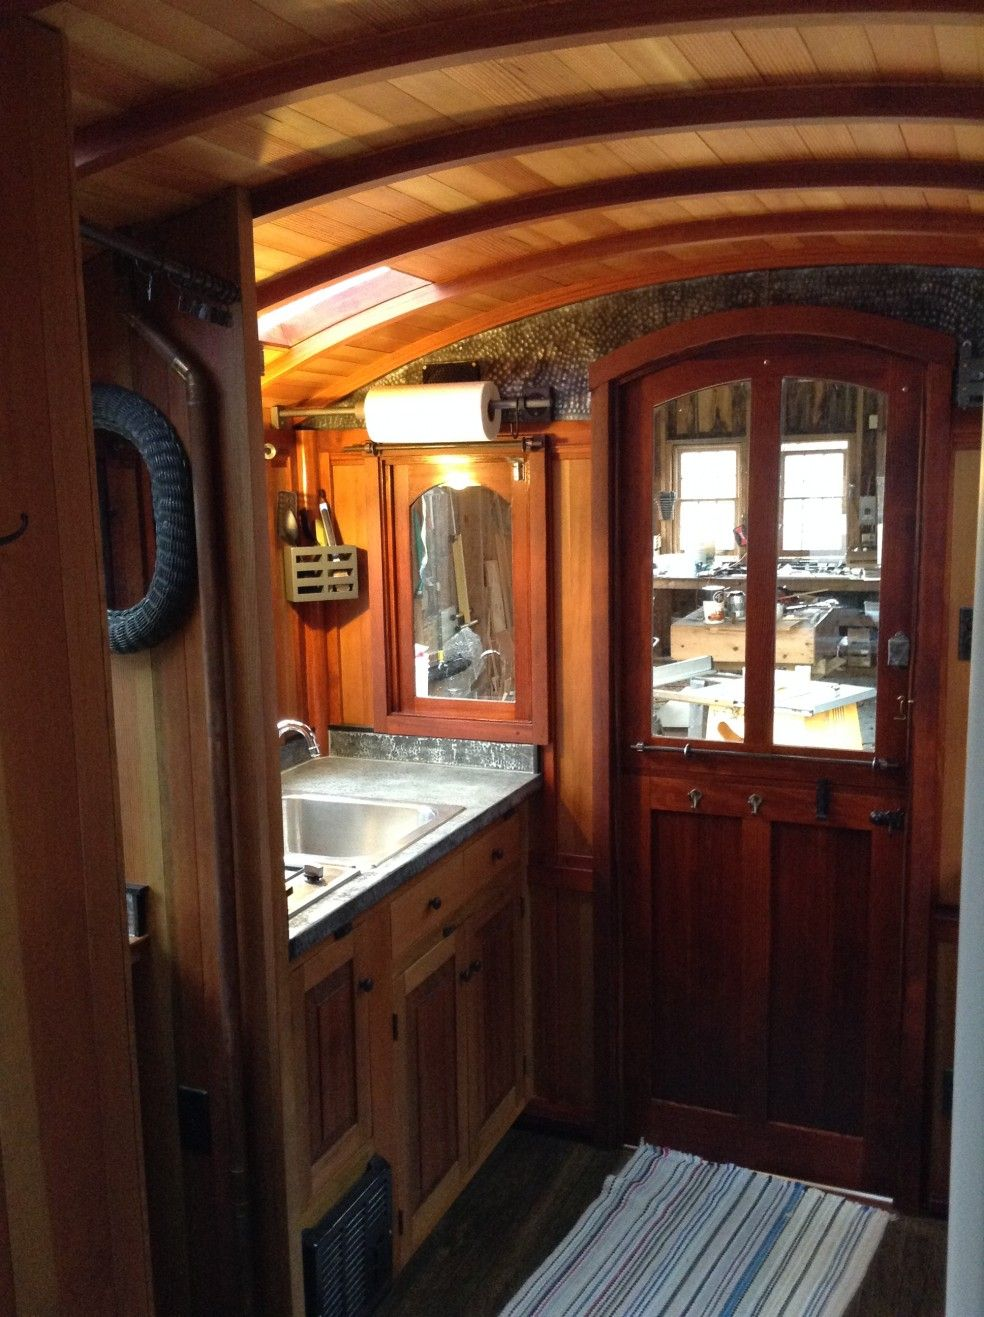 Tiny Home Designs: Interior Photos Of Greg Ryan's Gypsy Wagon